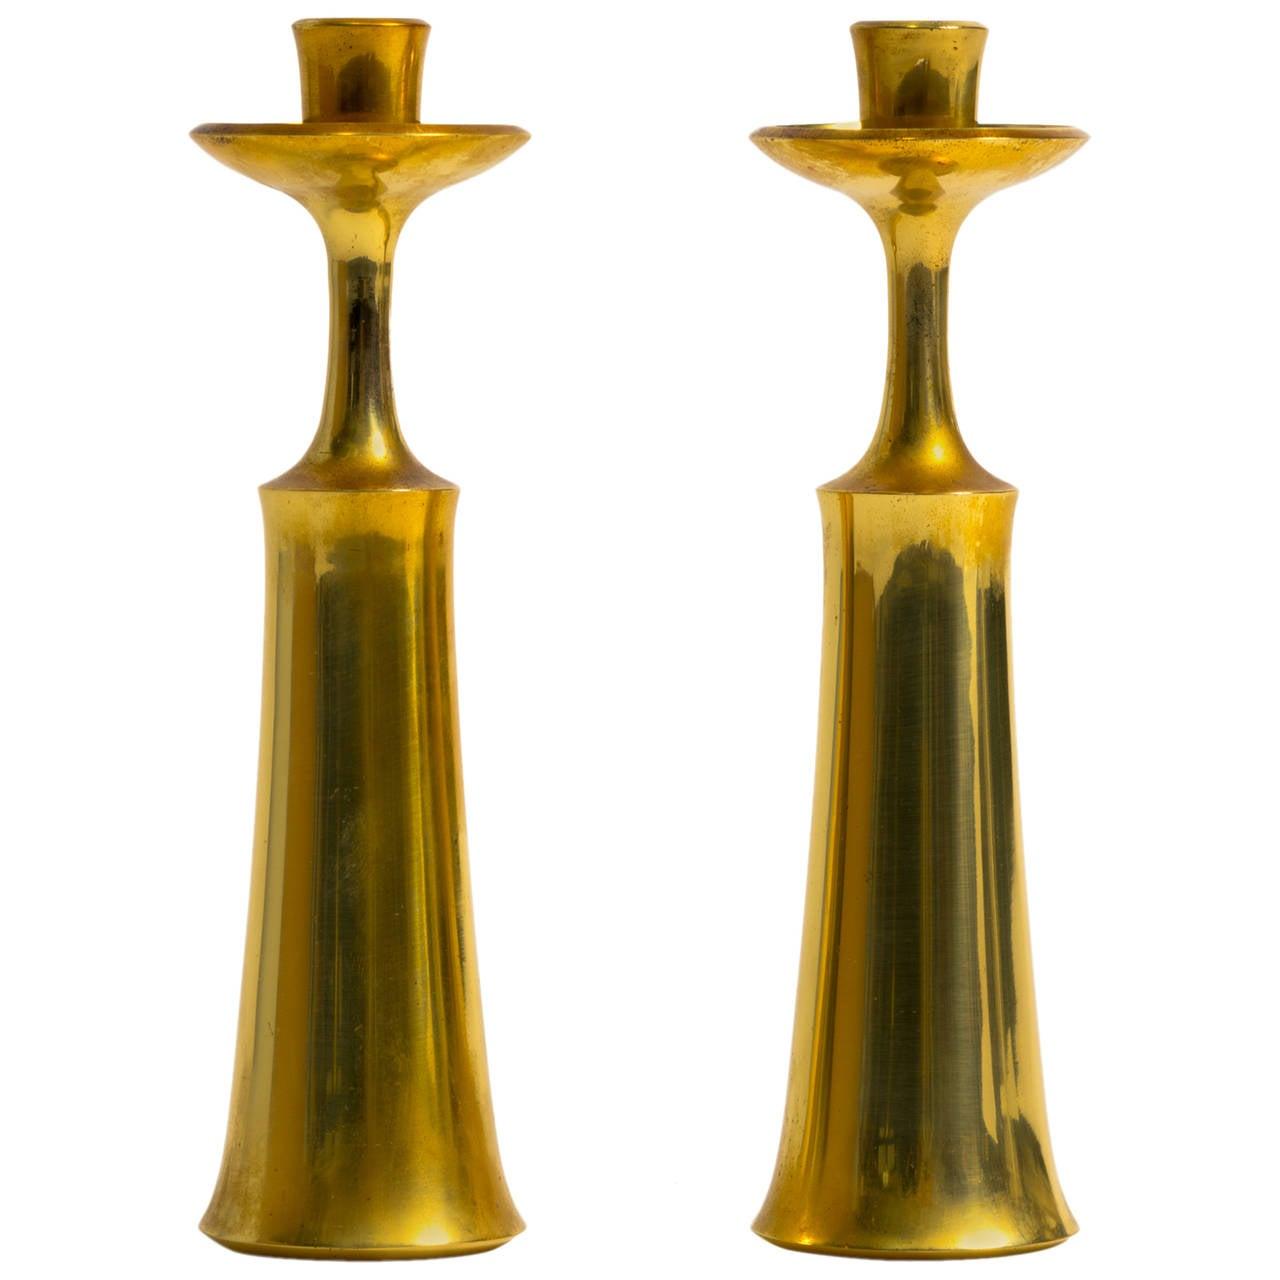 Pair of Brass Candlesticks by Jens Quistgaard for Dansk